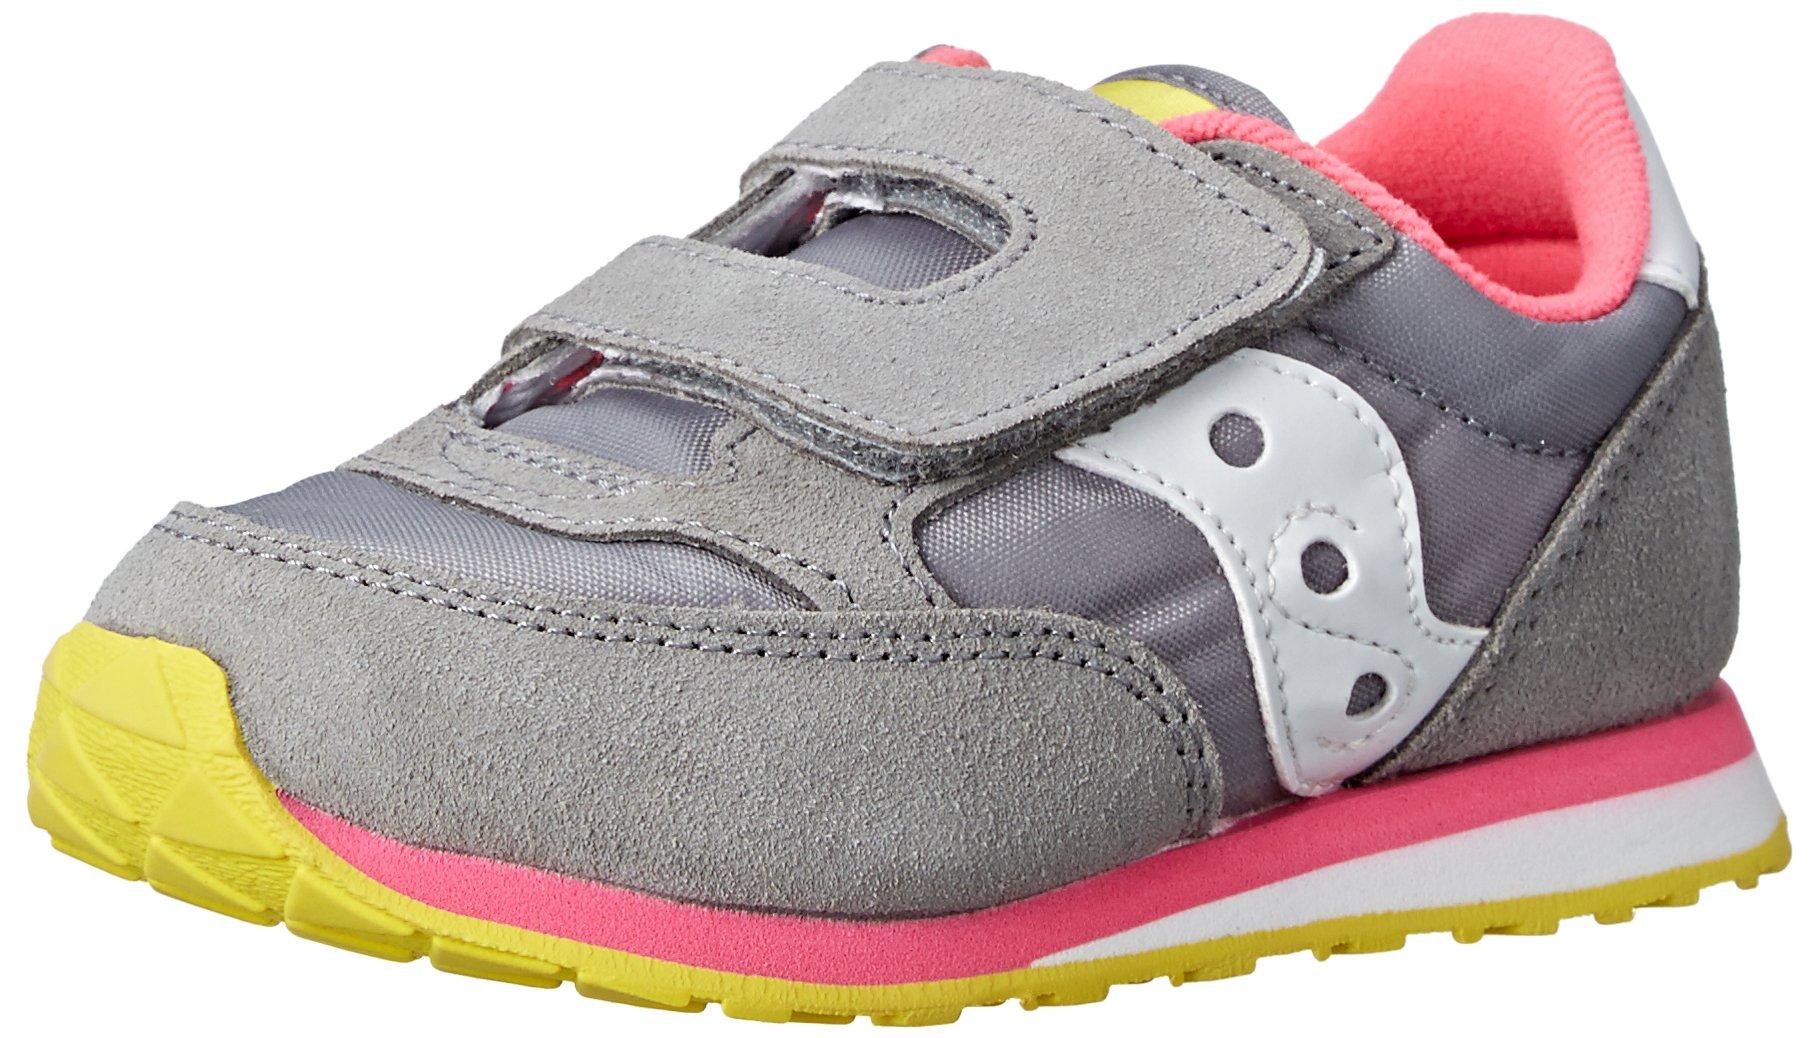 Saucony Girls Baby Jazz HL Sneaker (Toddler/Little Kid), Grey/Pink, 5 M US Toddler